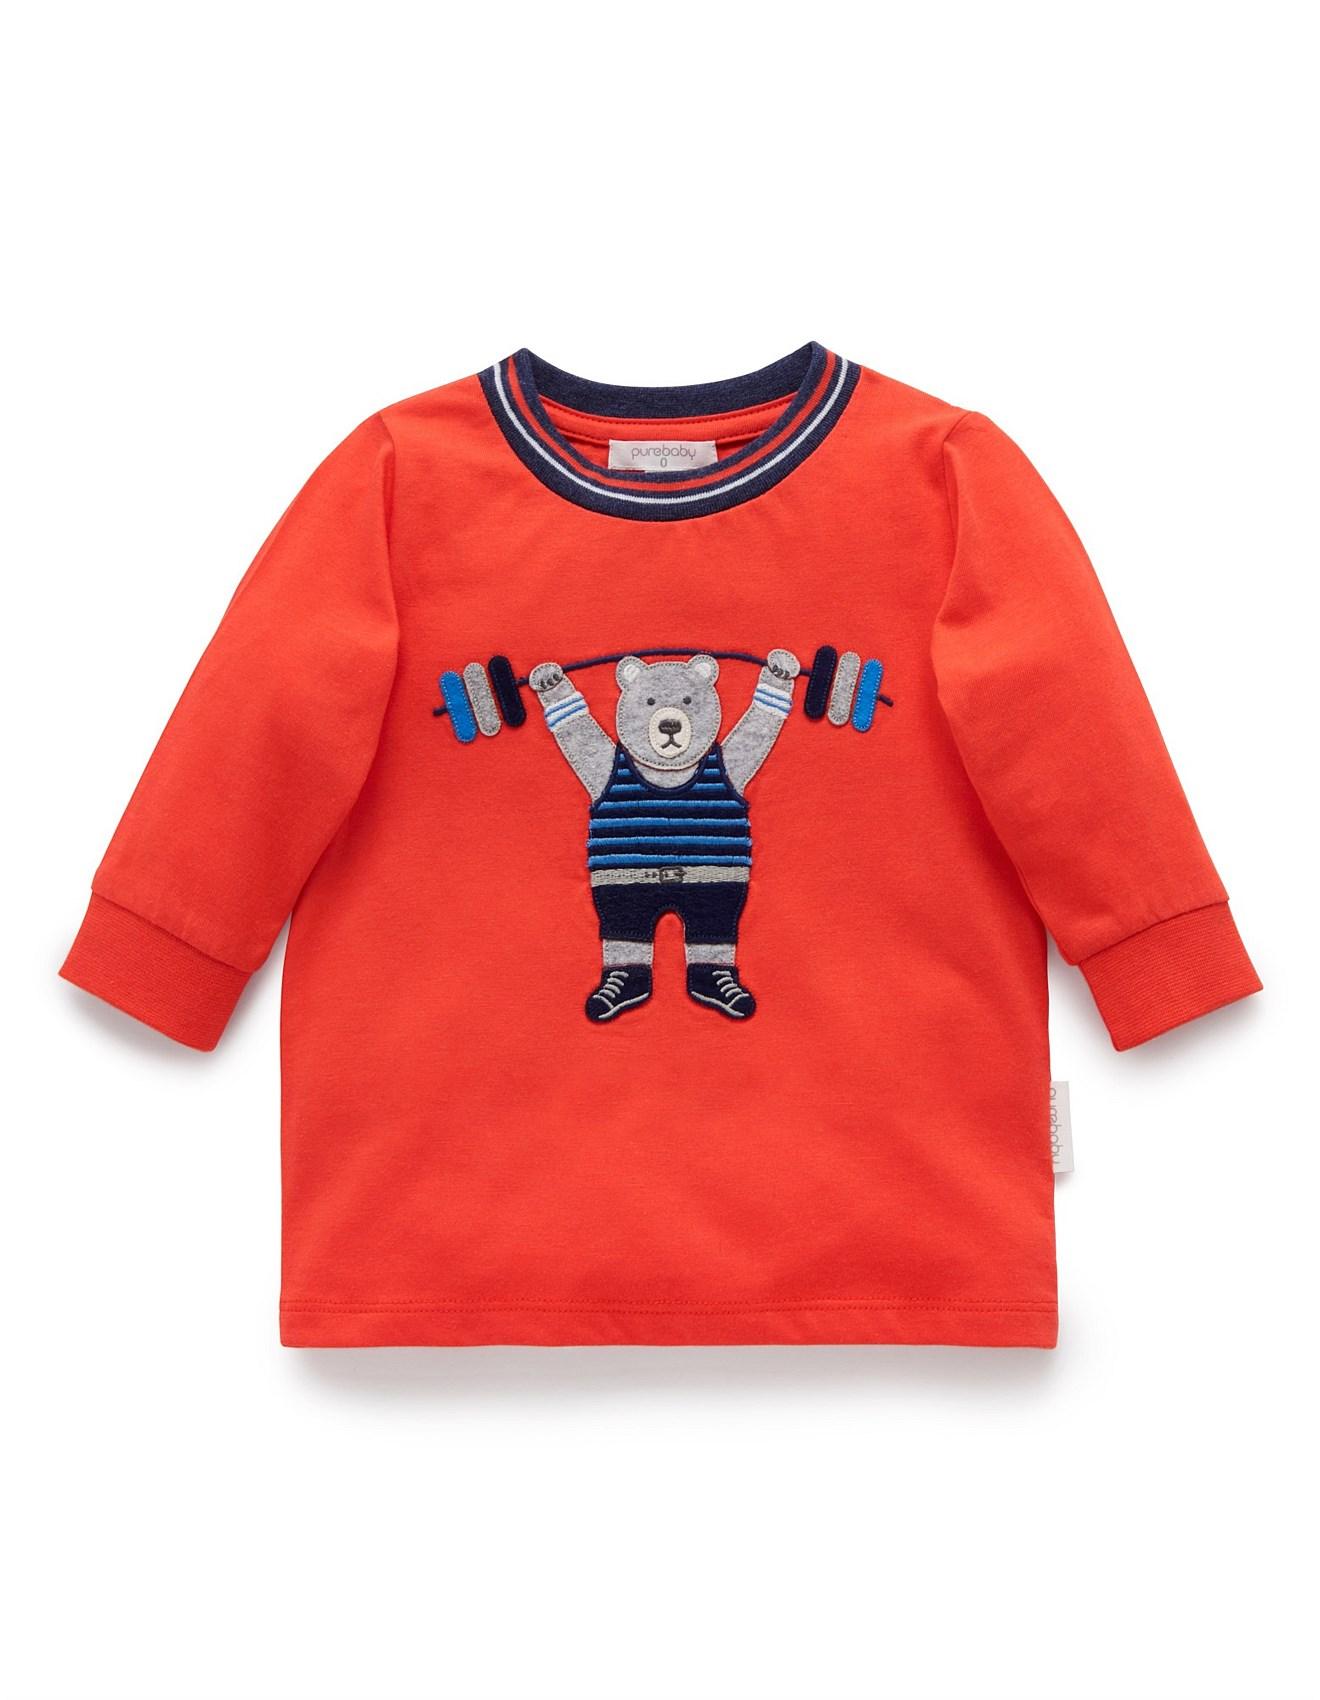 410e35dfa Kids Clothing Sale